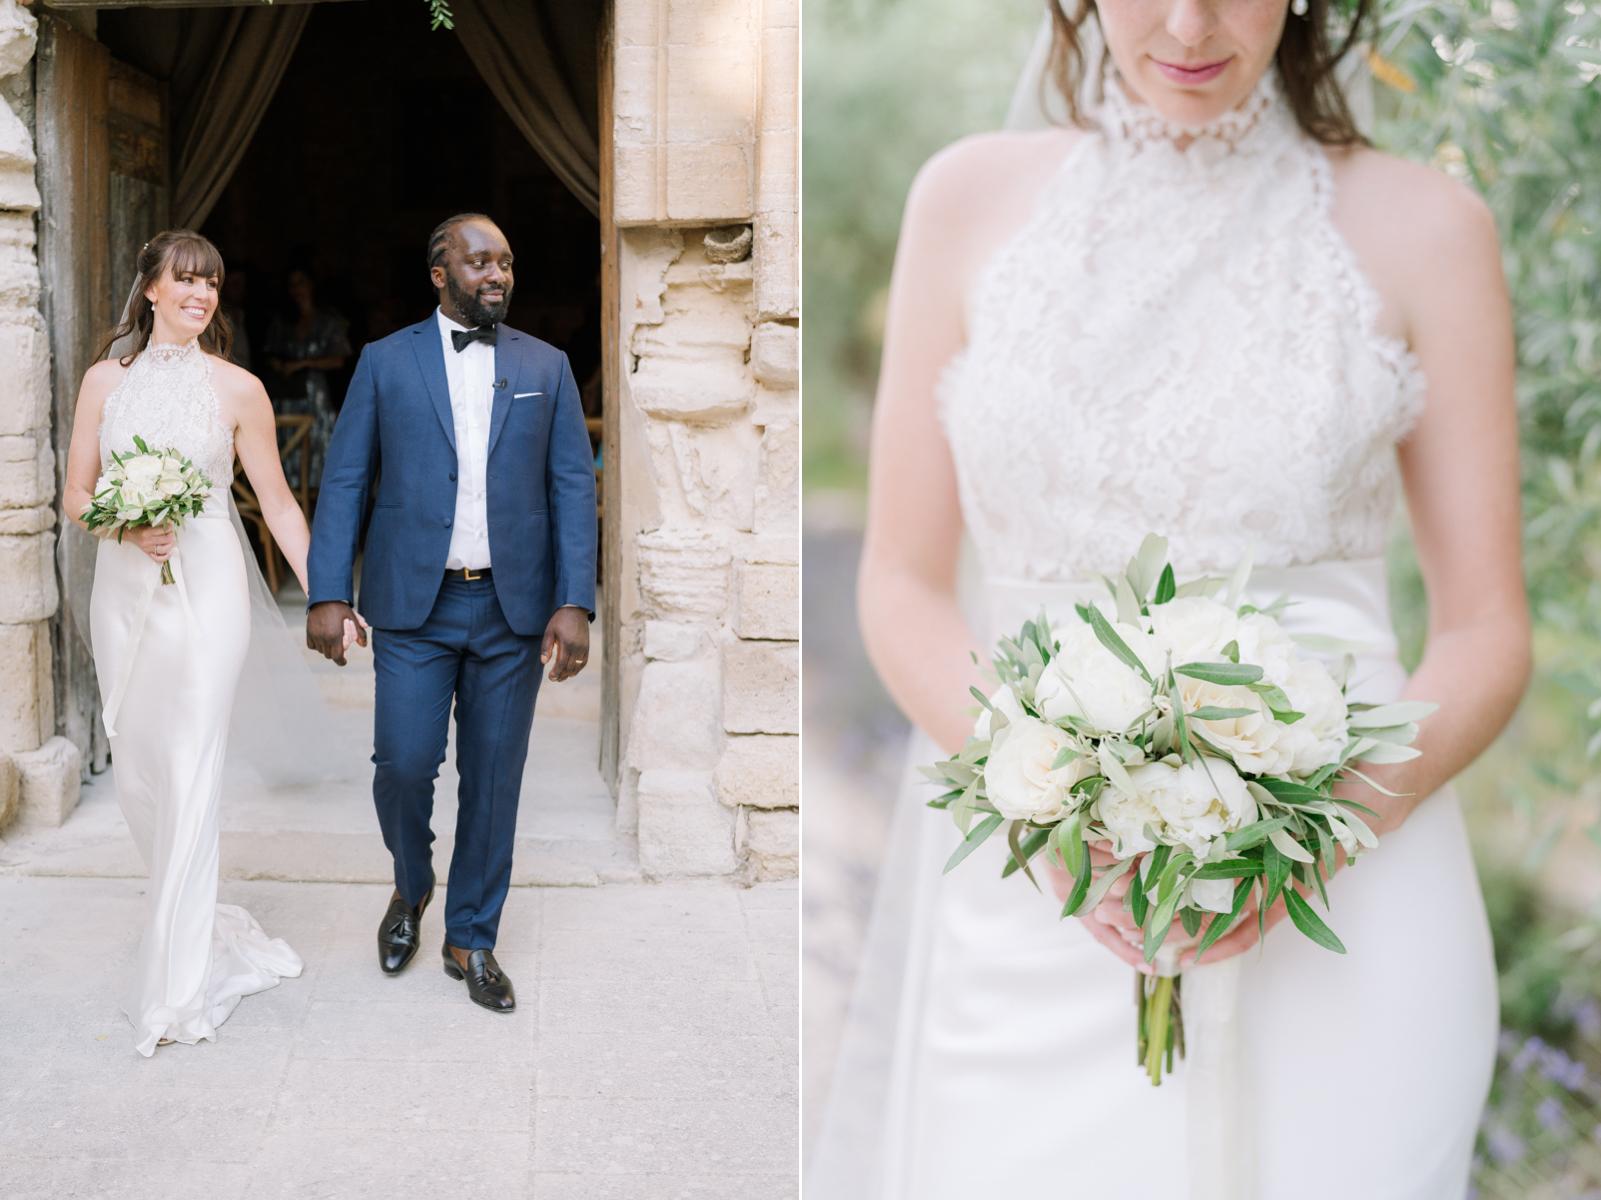 Boheme-Moon-Photography-Wedding-in-Provence-France_017.jpg